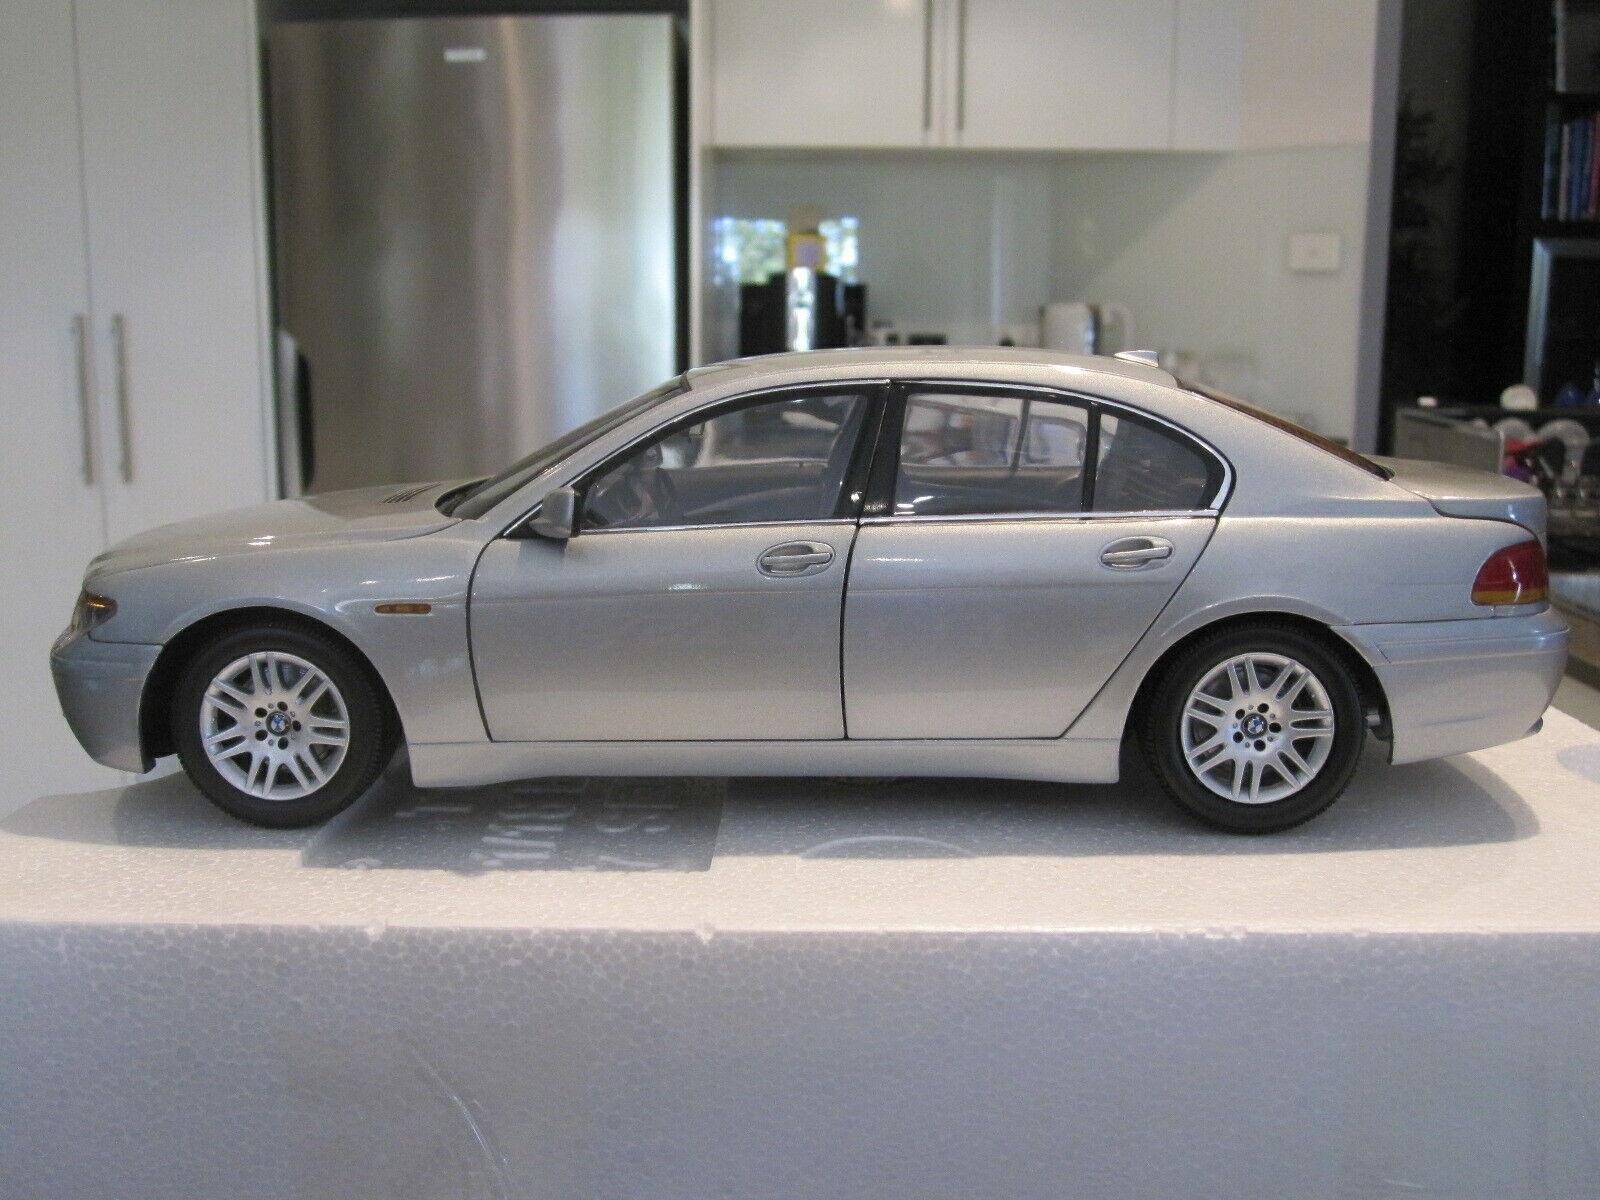 1 18 Kyosho 08571S BMW 745i E65 argento  Nuevo